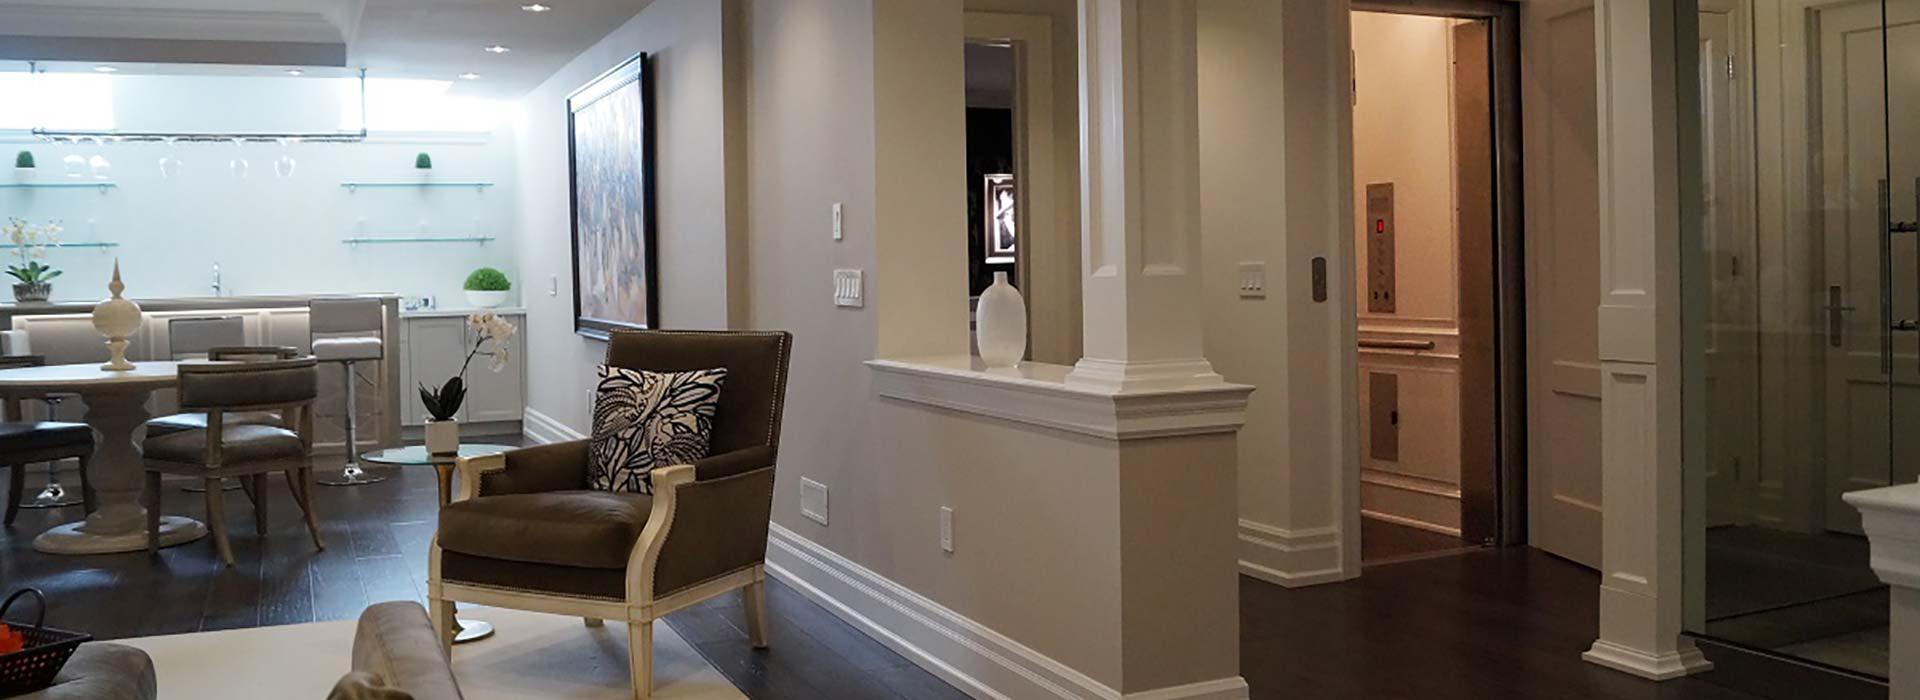 Home & Residential Elevators | Hydraulic Elevators | Federal Elevator 28